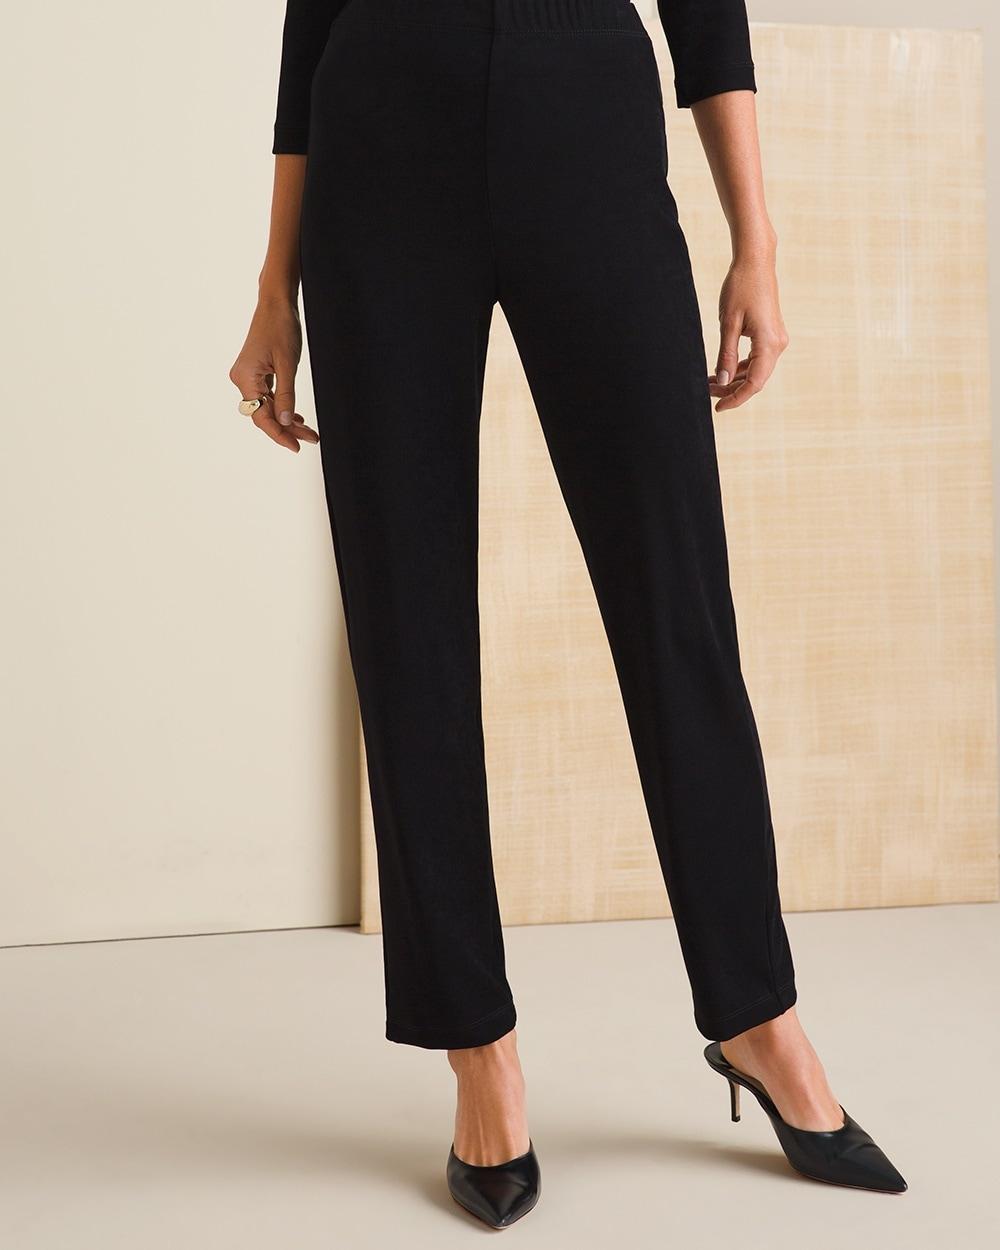 7efa15f9988 Essential Slim Pants - Chico s